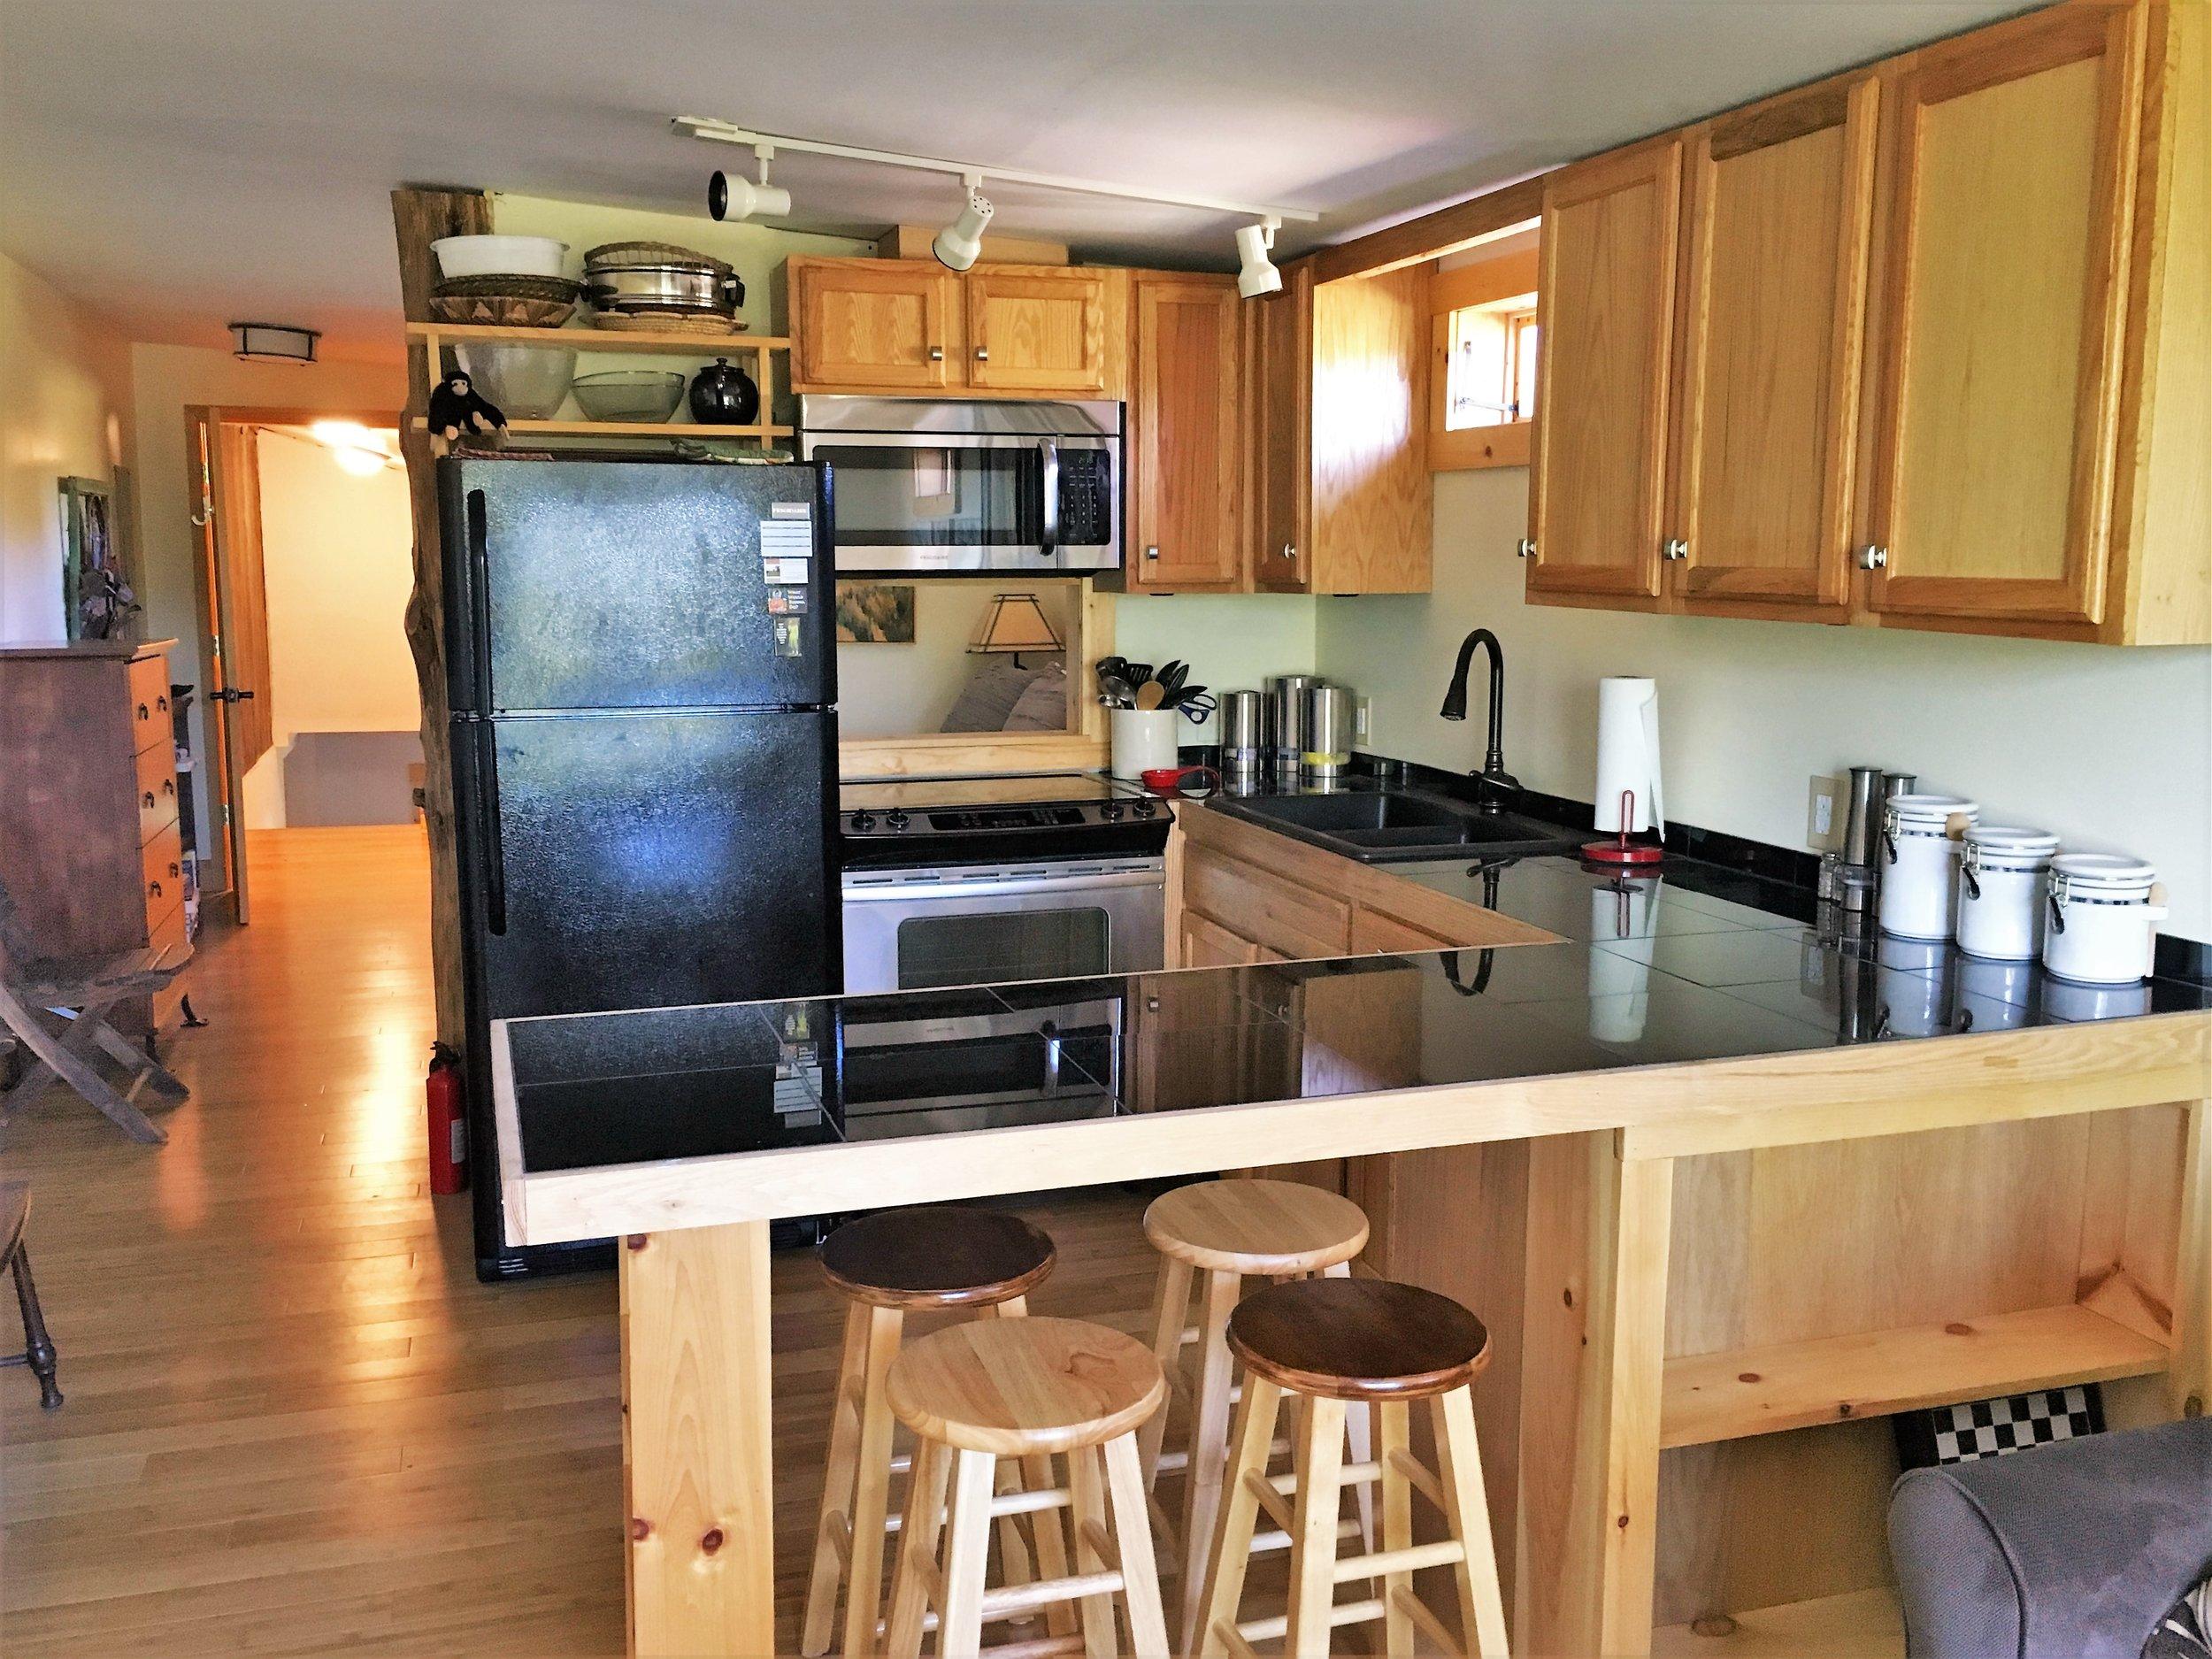 Antioa Albano Retreats   Blue Ridge Studio   Full Kitchen.JPG